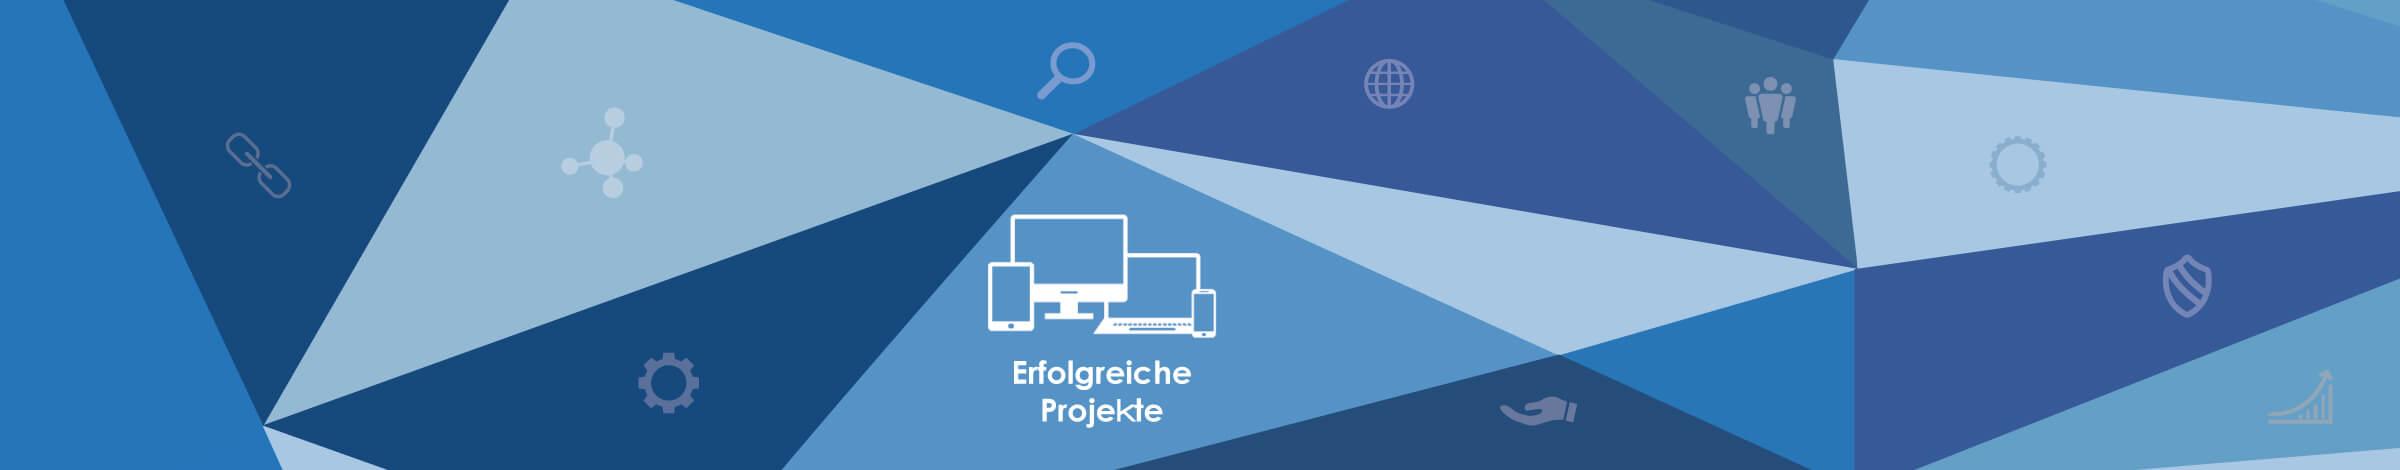 web_updates_kmu_wuk-ch_Projekte